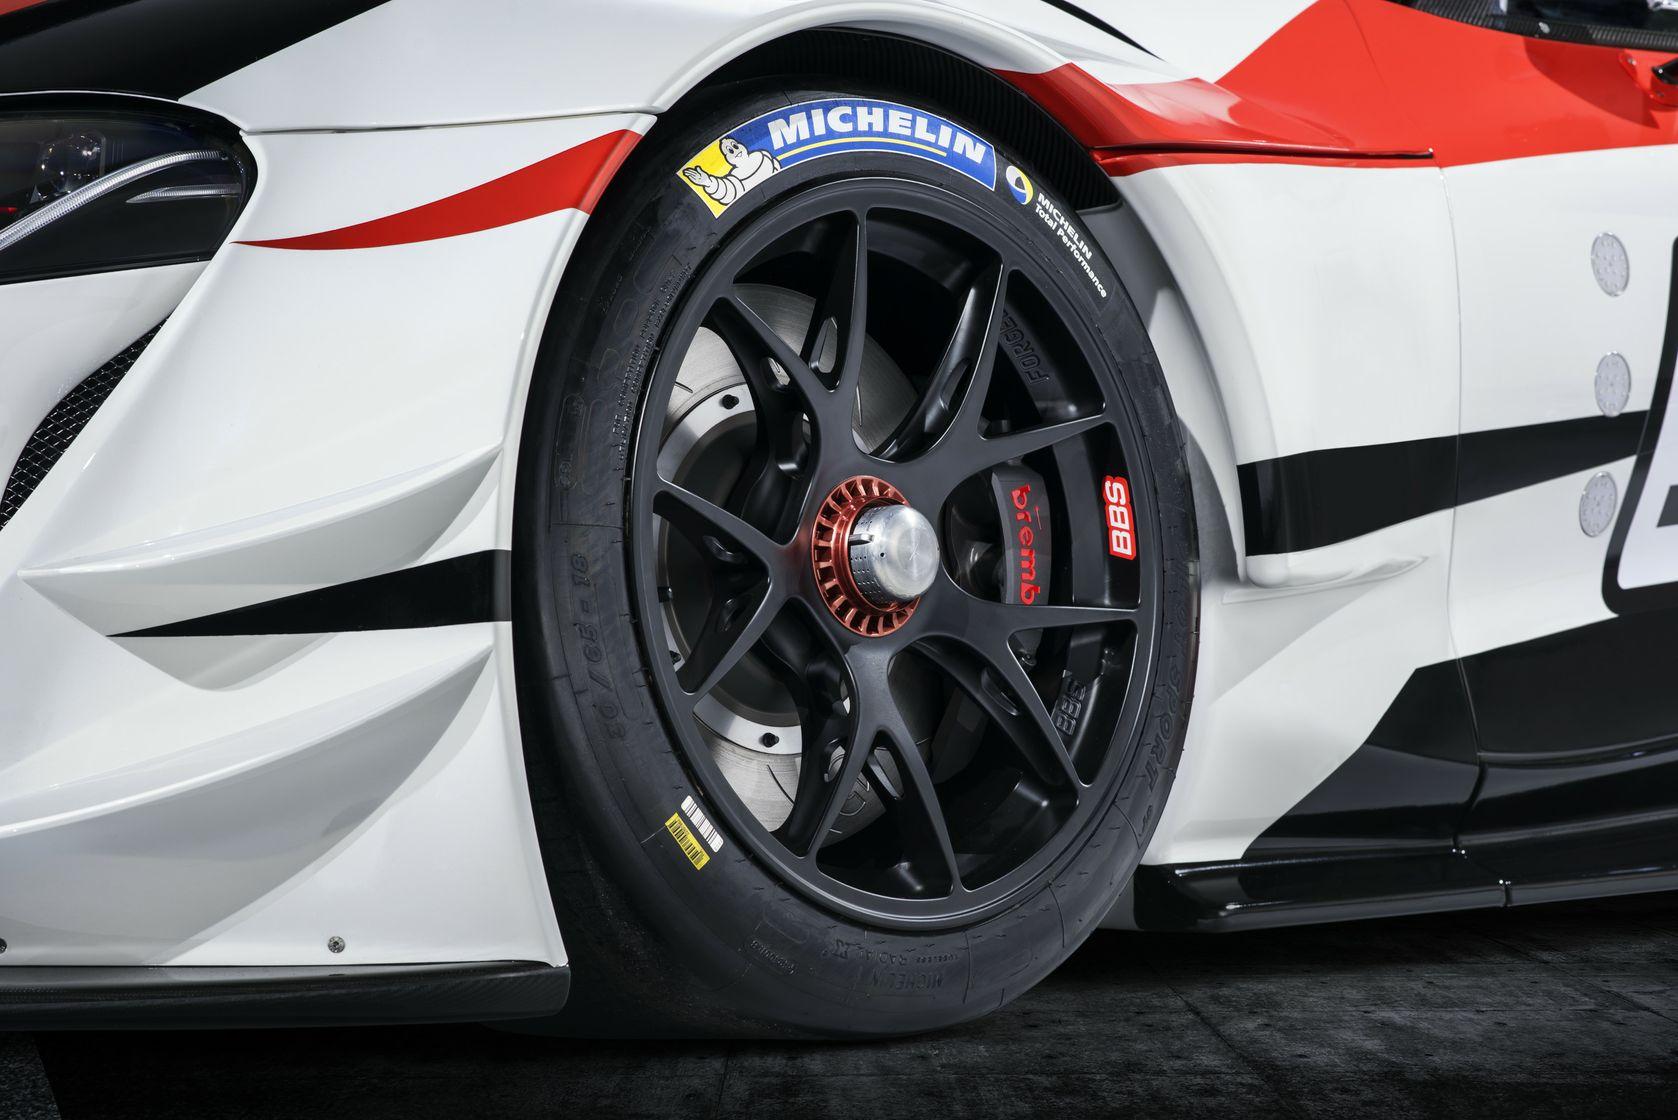 GR Supra Racing Concept - Exterior Details - 01